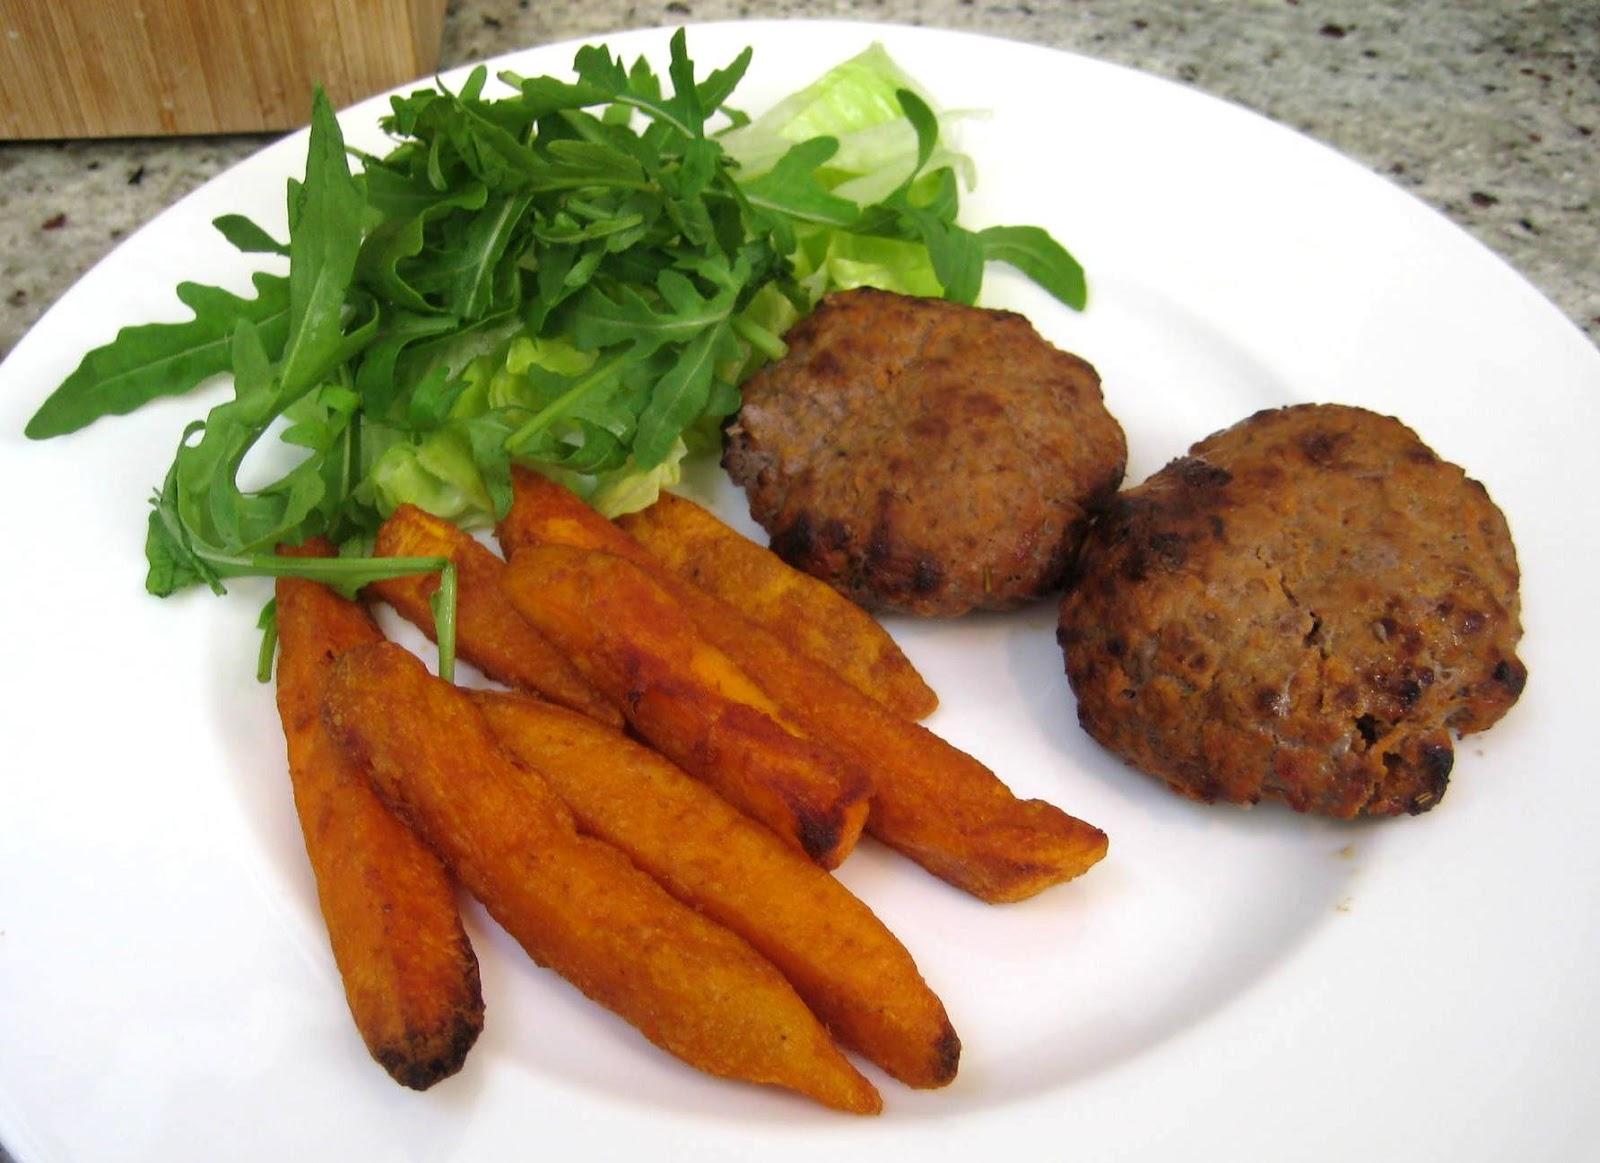 The FODMAP Foodie: FODMAP Diet Burger Recipe